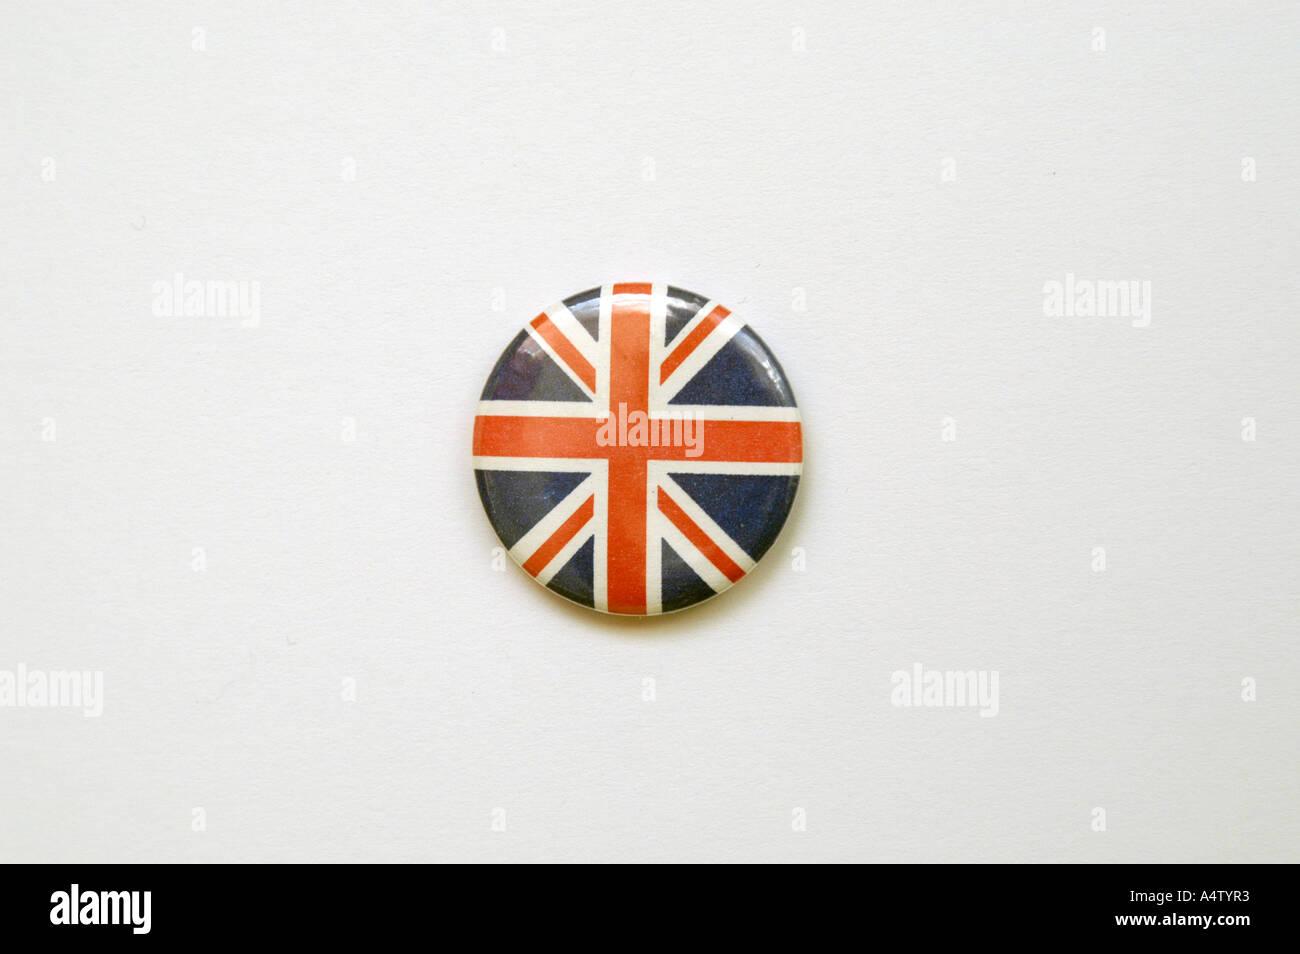 Badge of patriotic Union Flag England UK - Stock Image